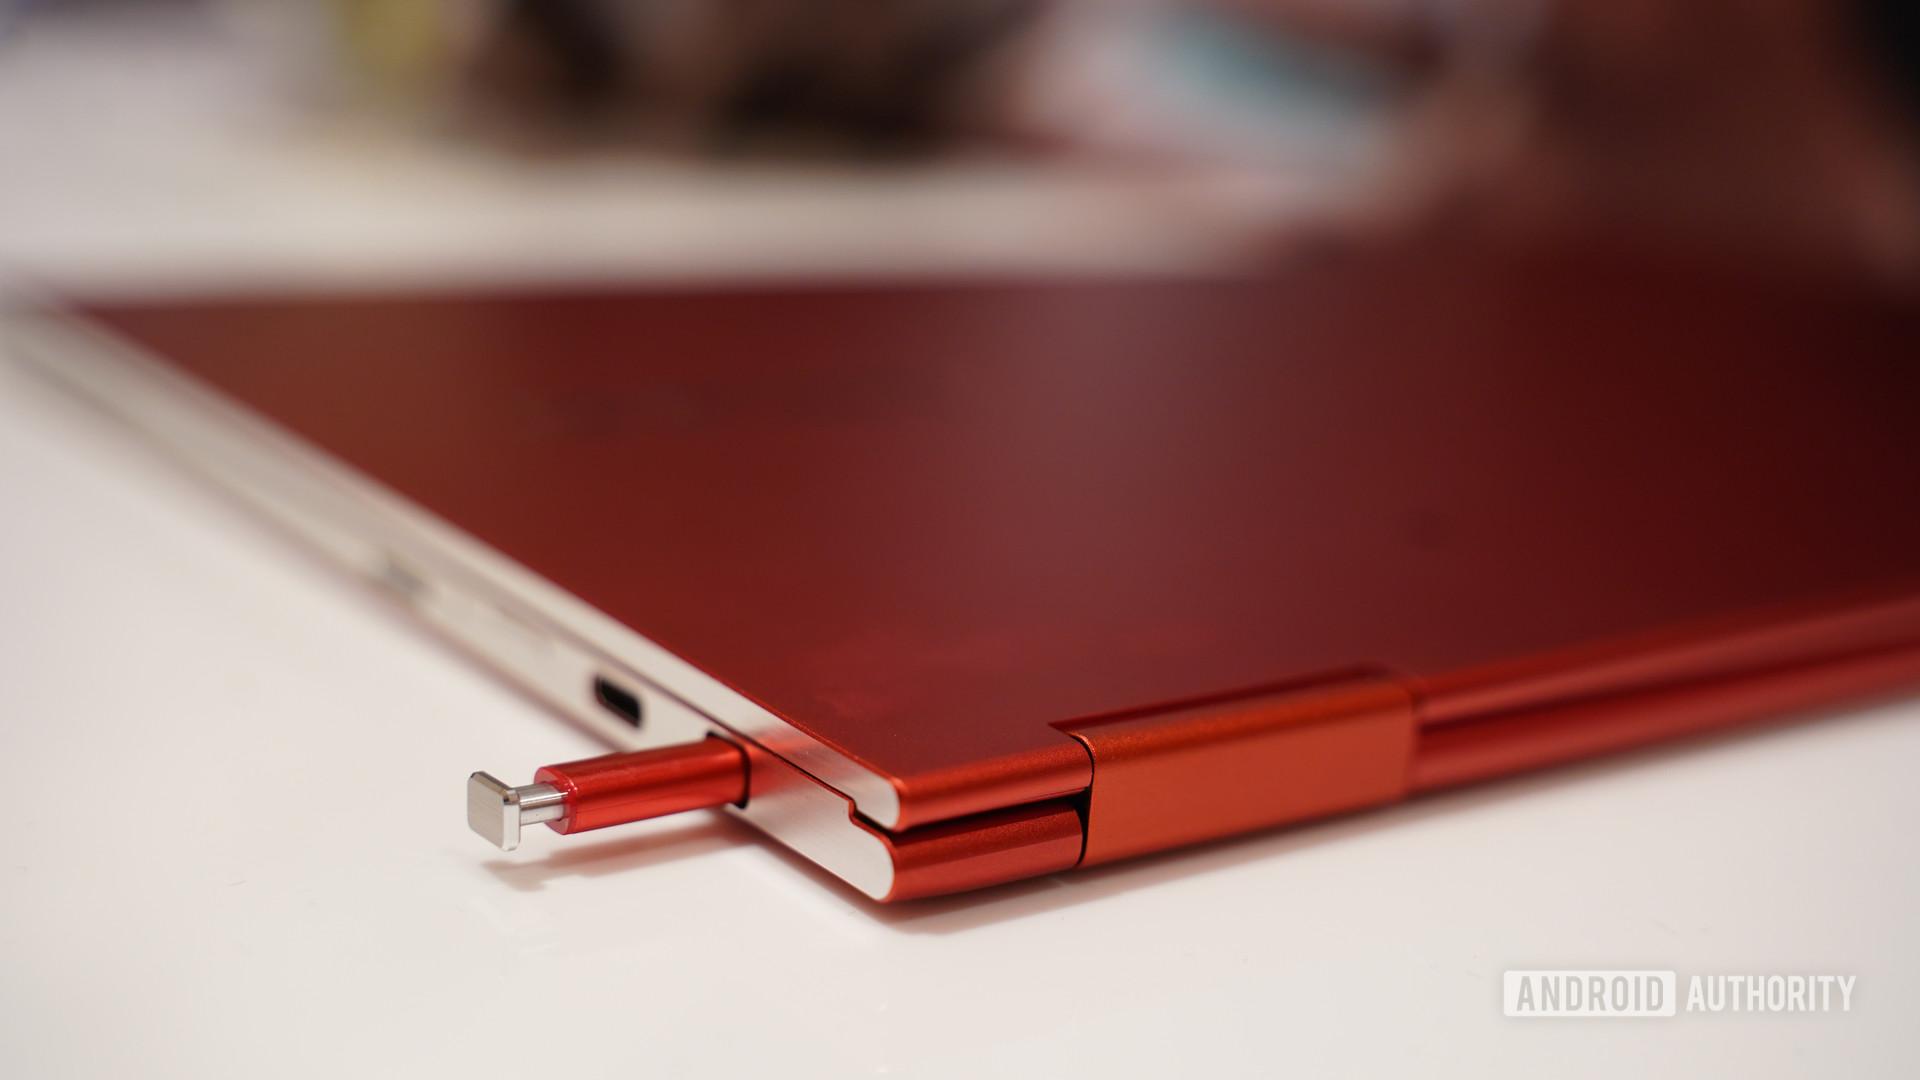 Samsung Galaxy Chromebook 6 of 11